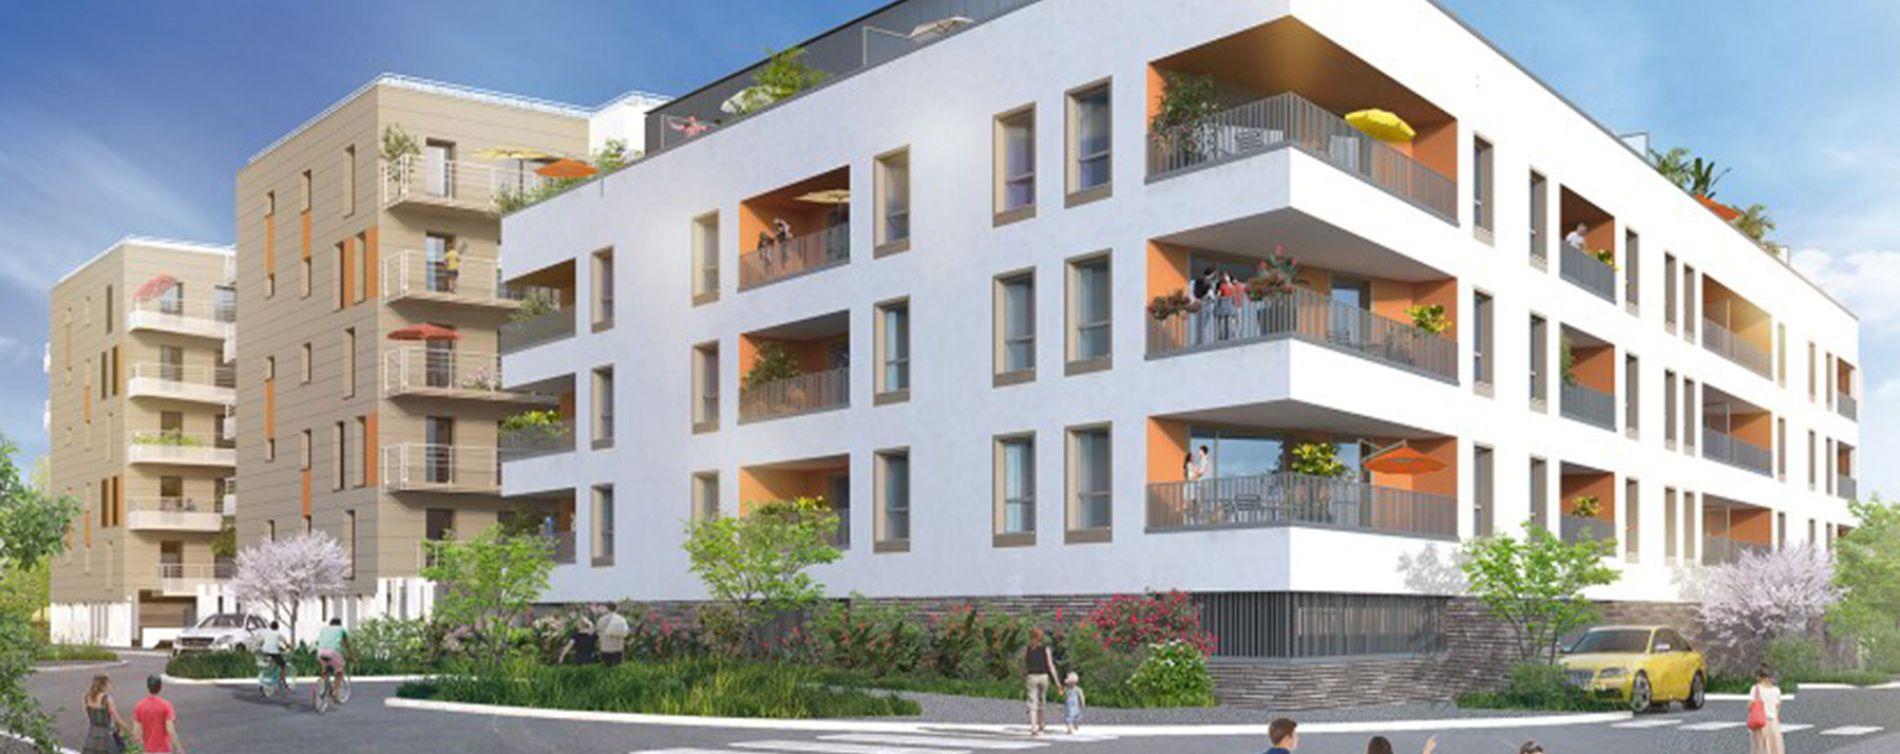 Résidence Villa Garance à Rouen